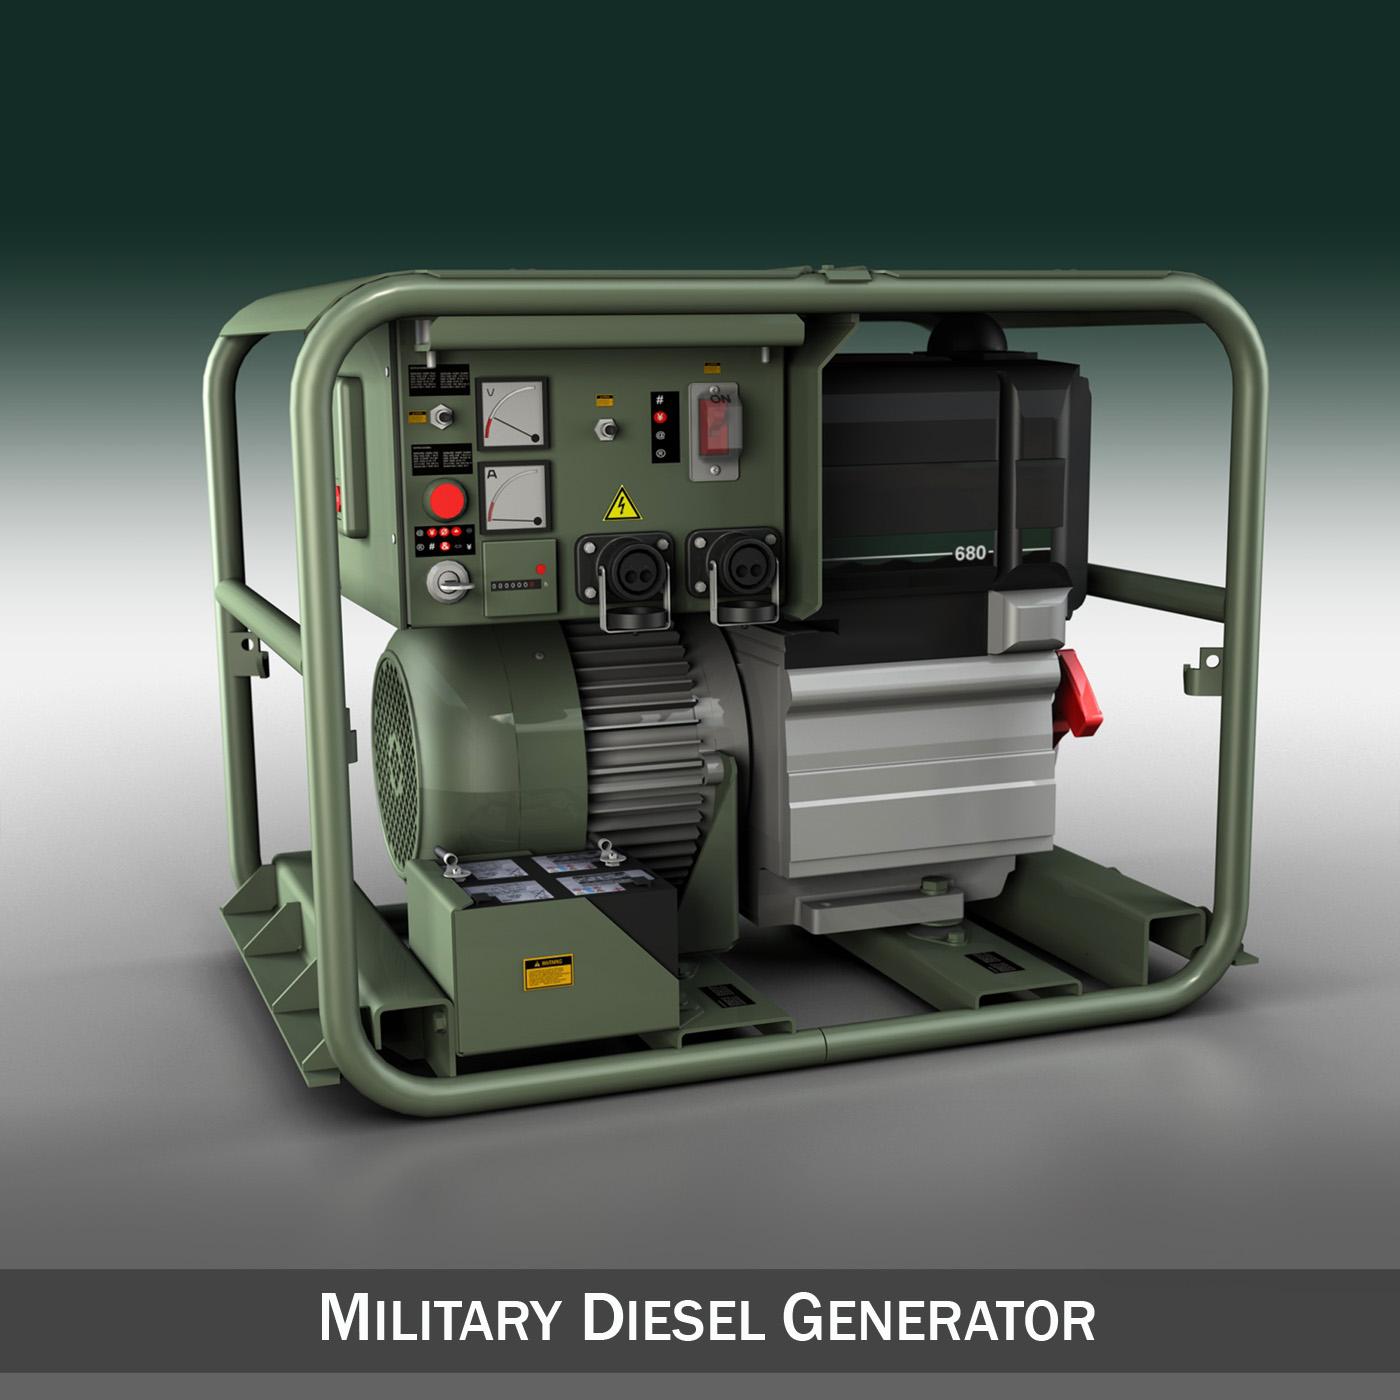 military diesel generator 3d model 3ds fbx c4d lwo obj 188555